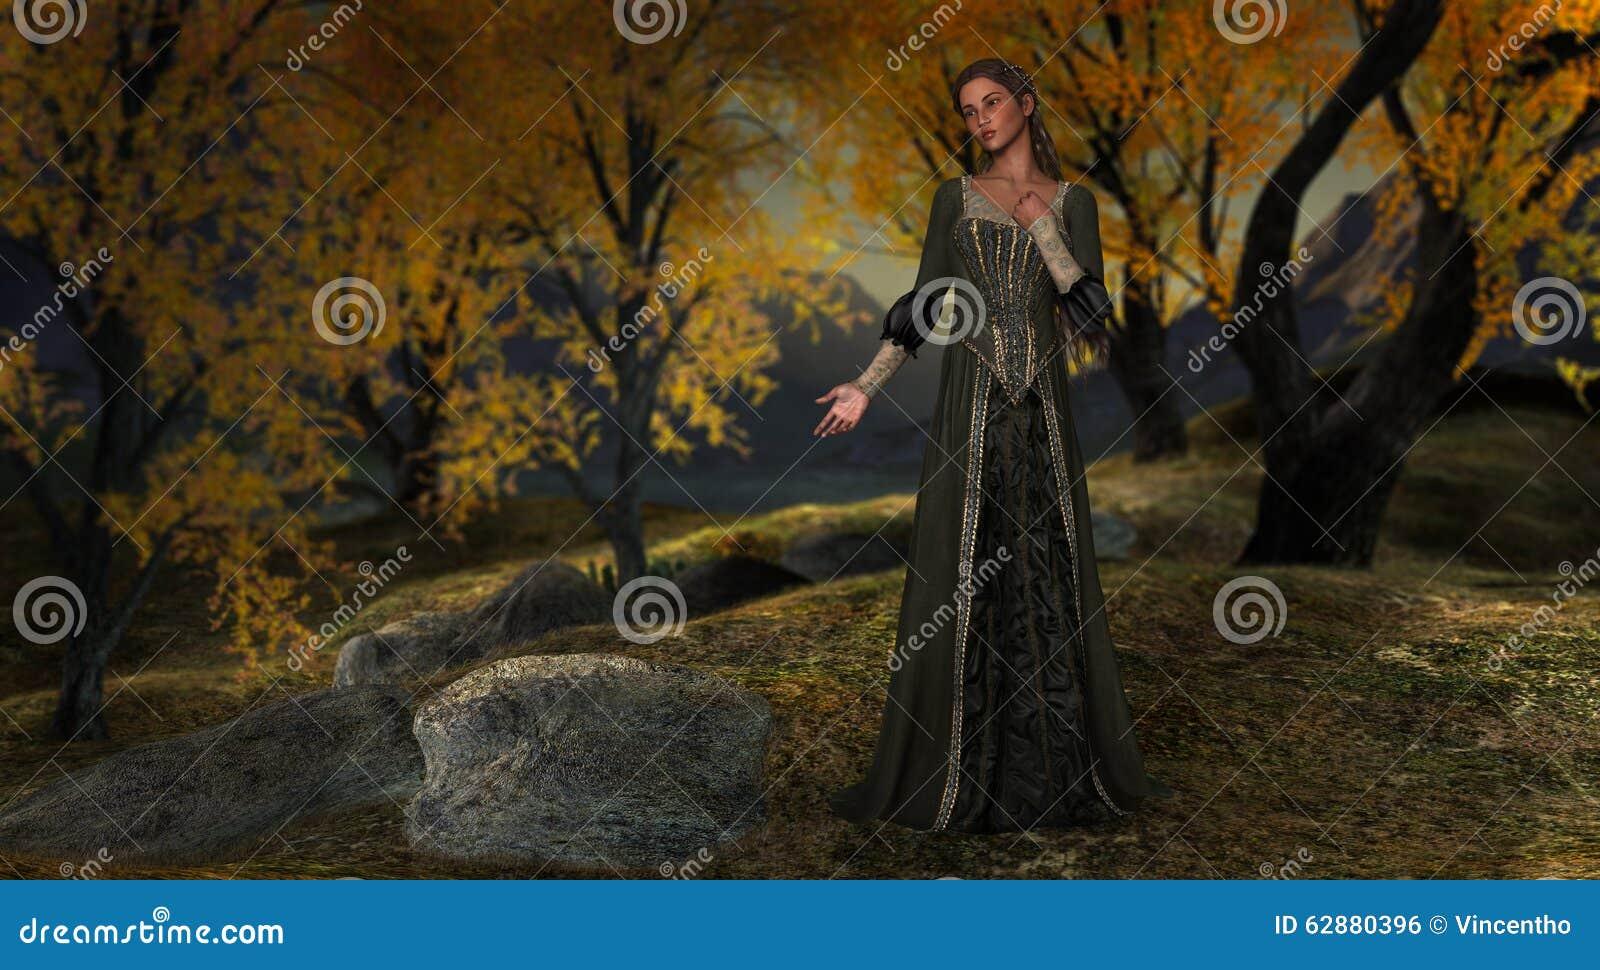 Prinsessa Hushed Peaceful Forest Illustration